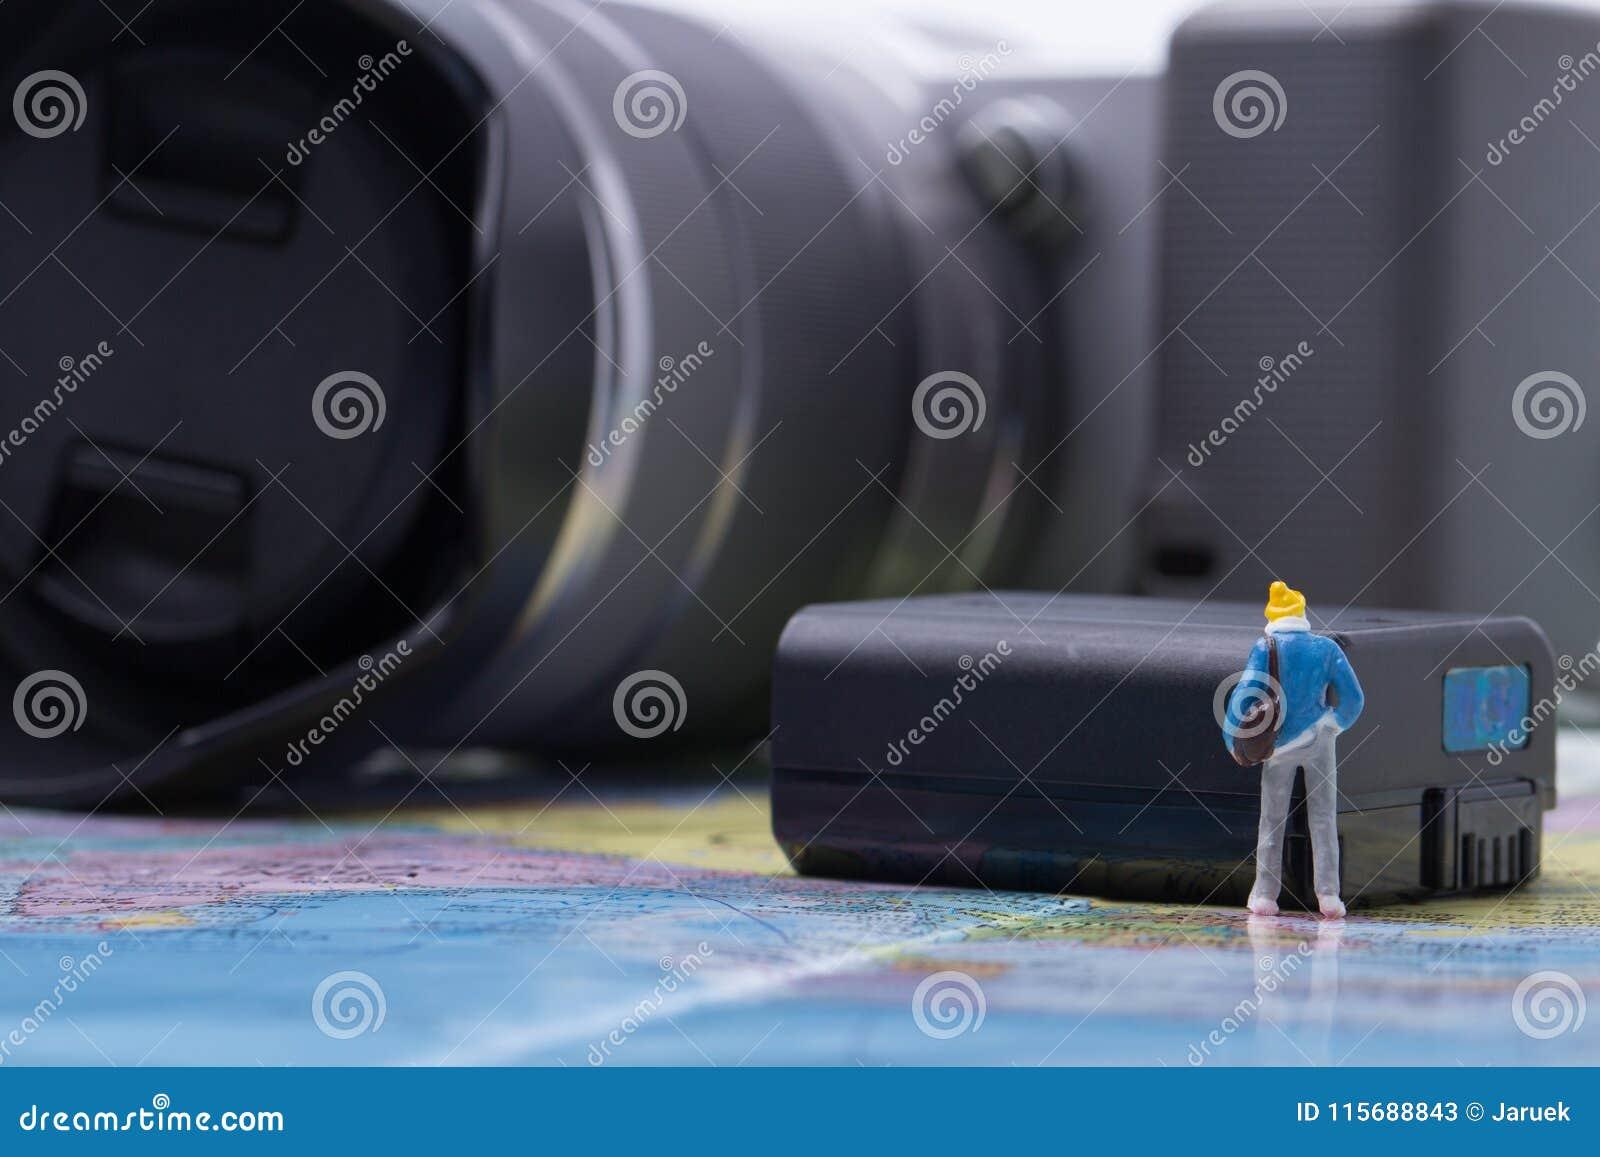 Mini people model checking digital camera for travel